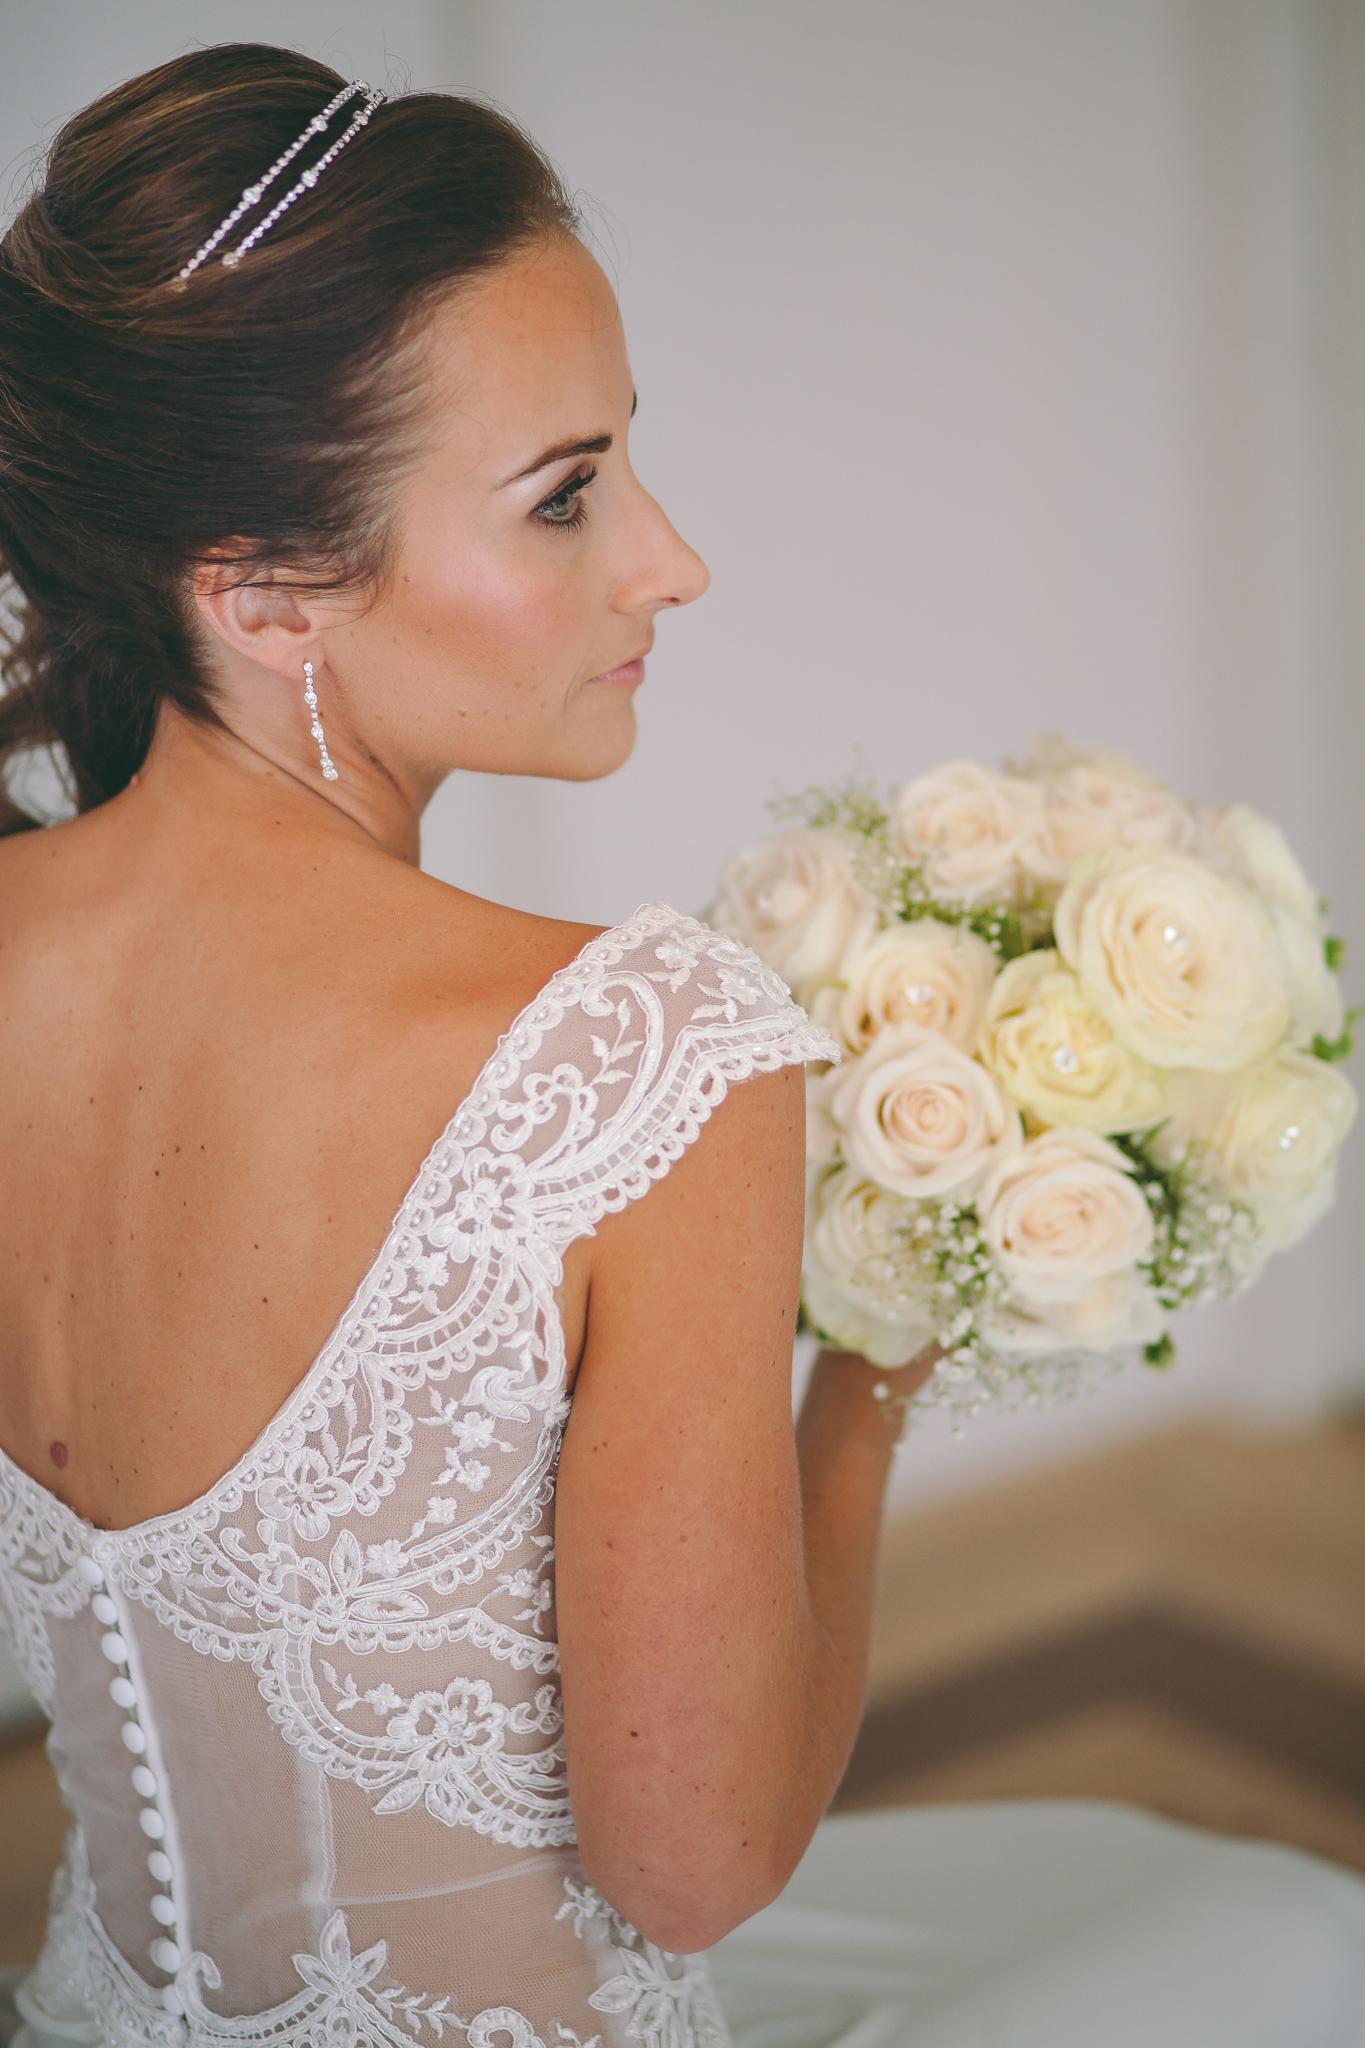 Amy D Photography- Barrie Wedding Photography- Bride Getting Ready- Muskoka Wedding Photography- Best Wedding Photographers (79 of 130).jpg